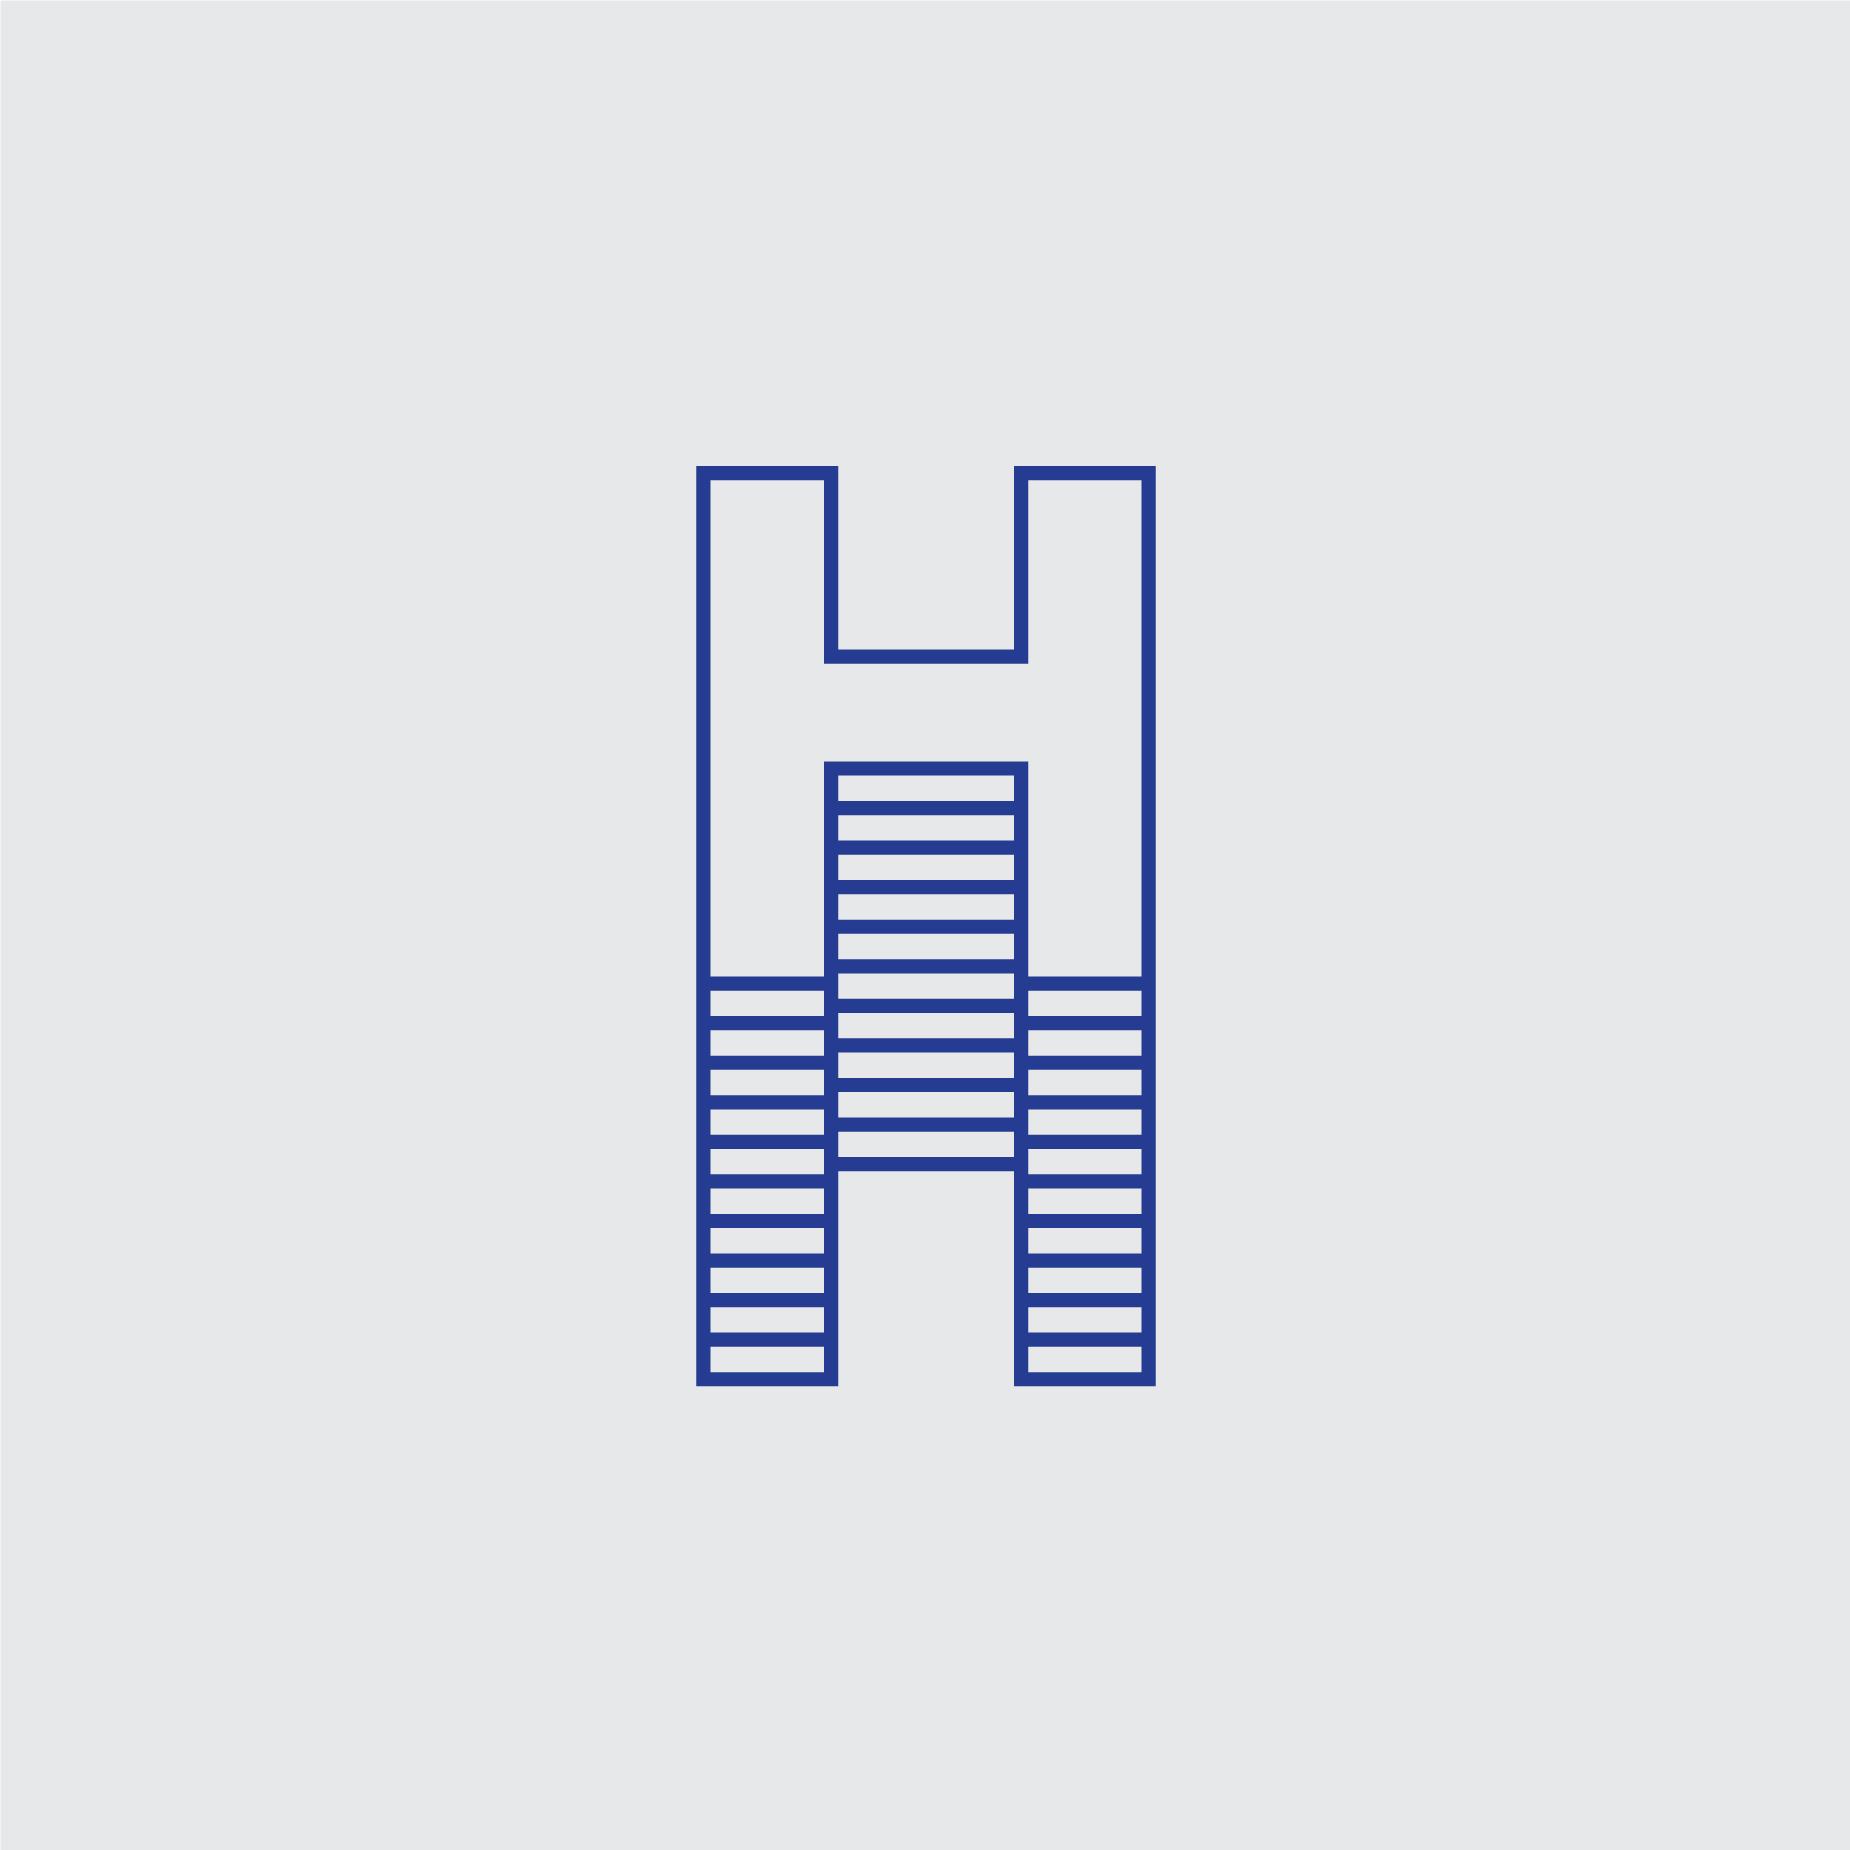 New work — Unused Identity.HARBOR.#logo #logos #logodesigner #logodesign #design #designer #designagency #london #dorset #identity #branding #brand #agency #graphicdesign #graphicdesigner #brandingagency #type #typography #designinspiration